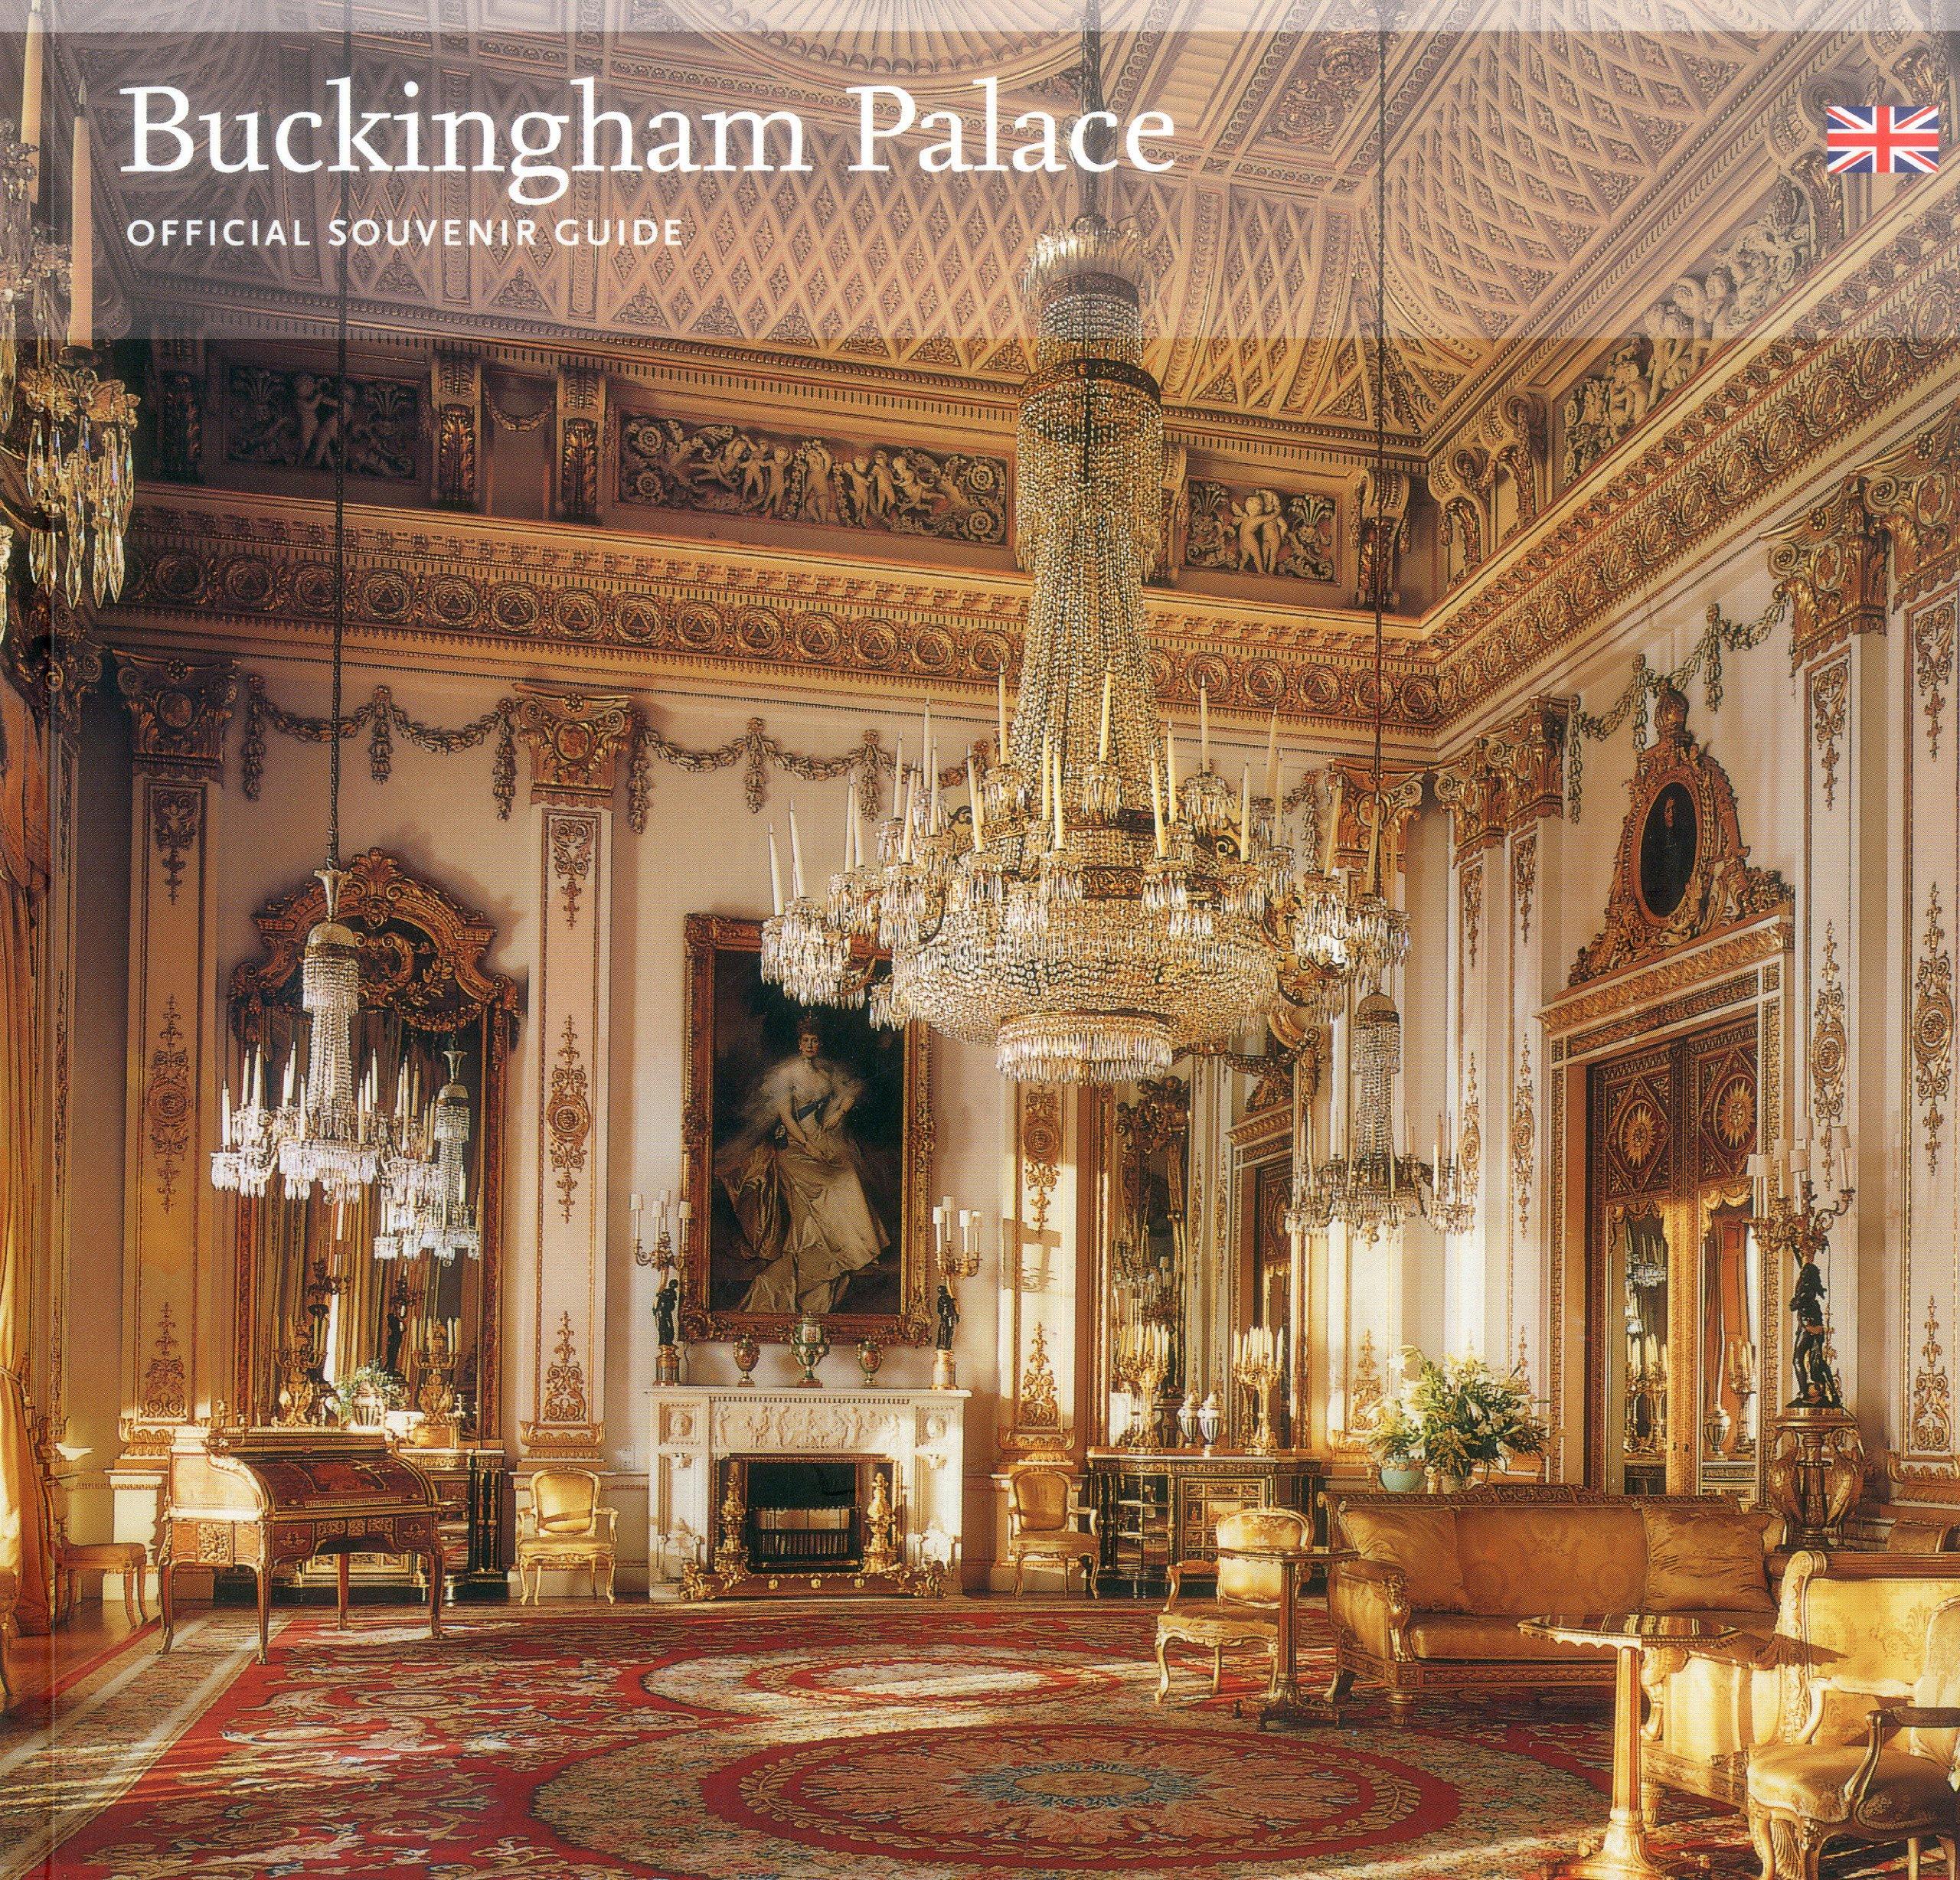 Buckingham Palace: Official Souvenir Guide: Jonathan Marsden:  9781857597578: Amazon.com: Books